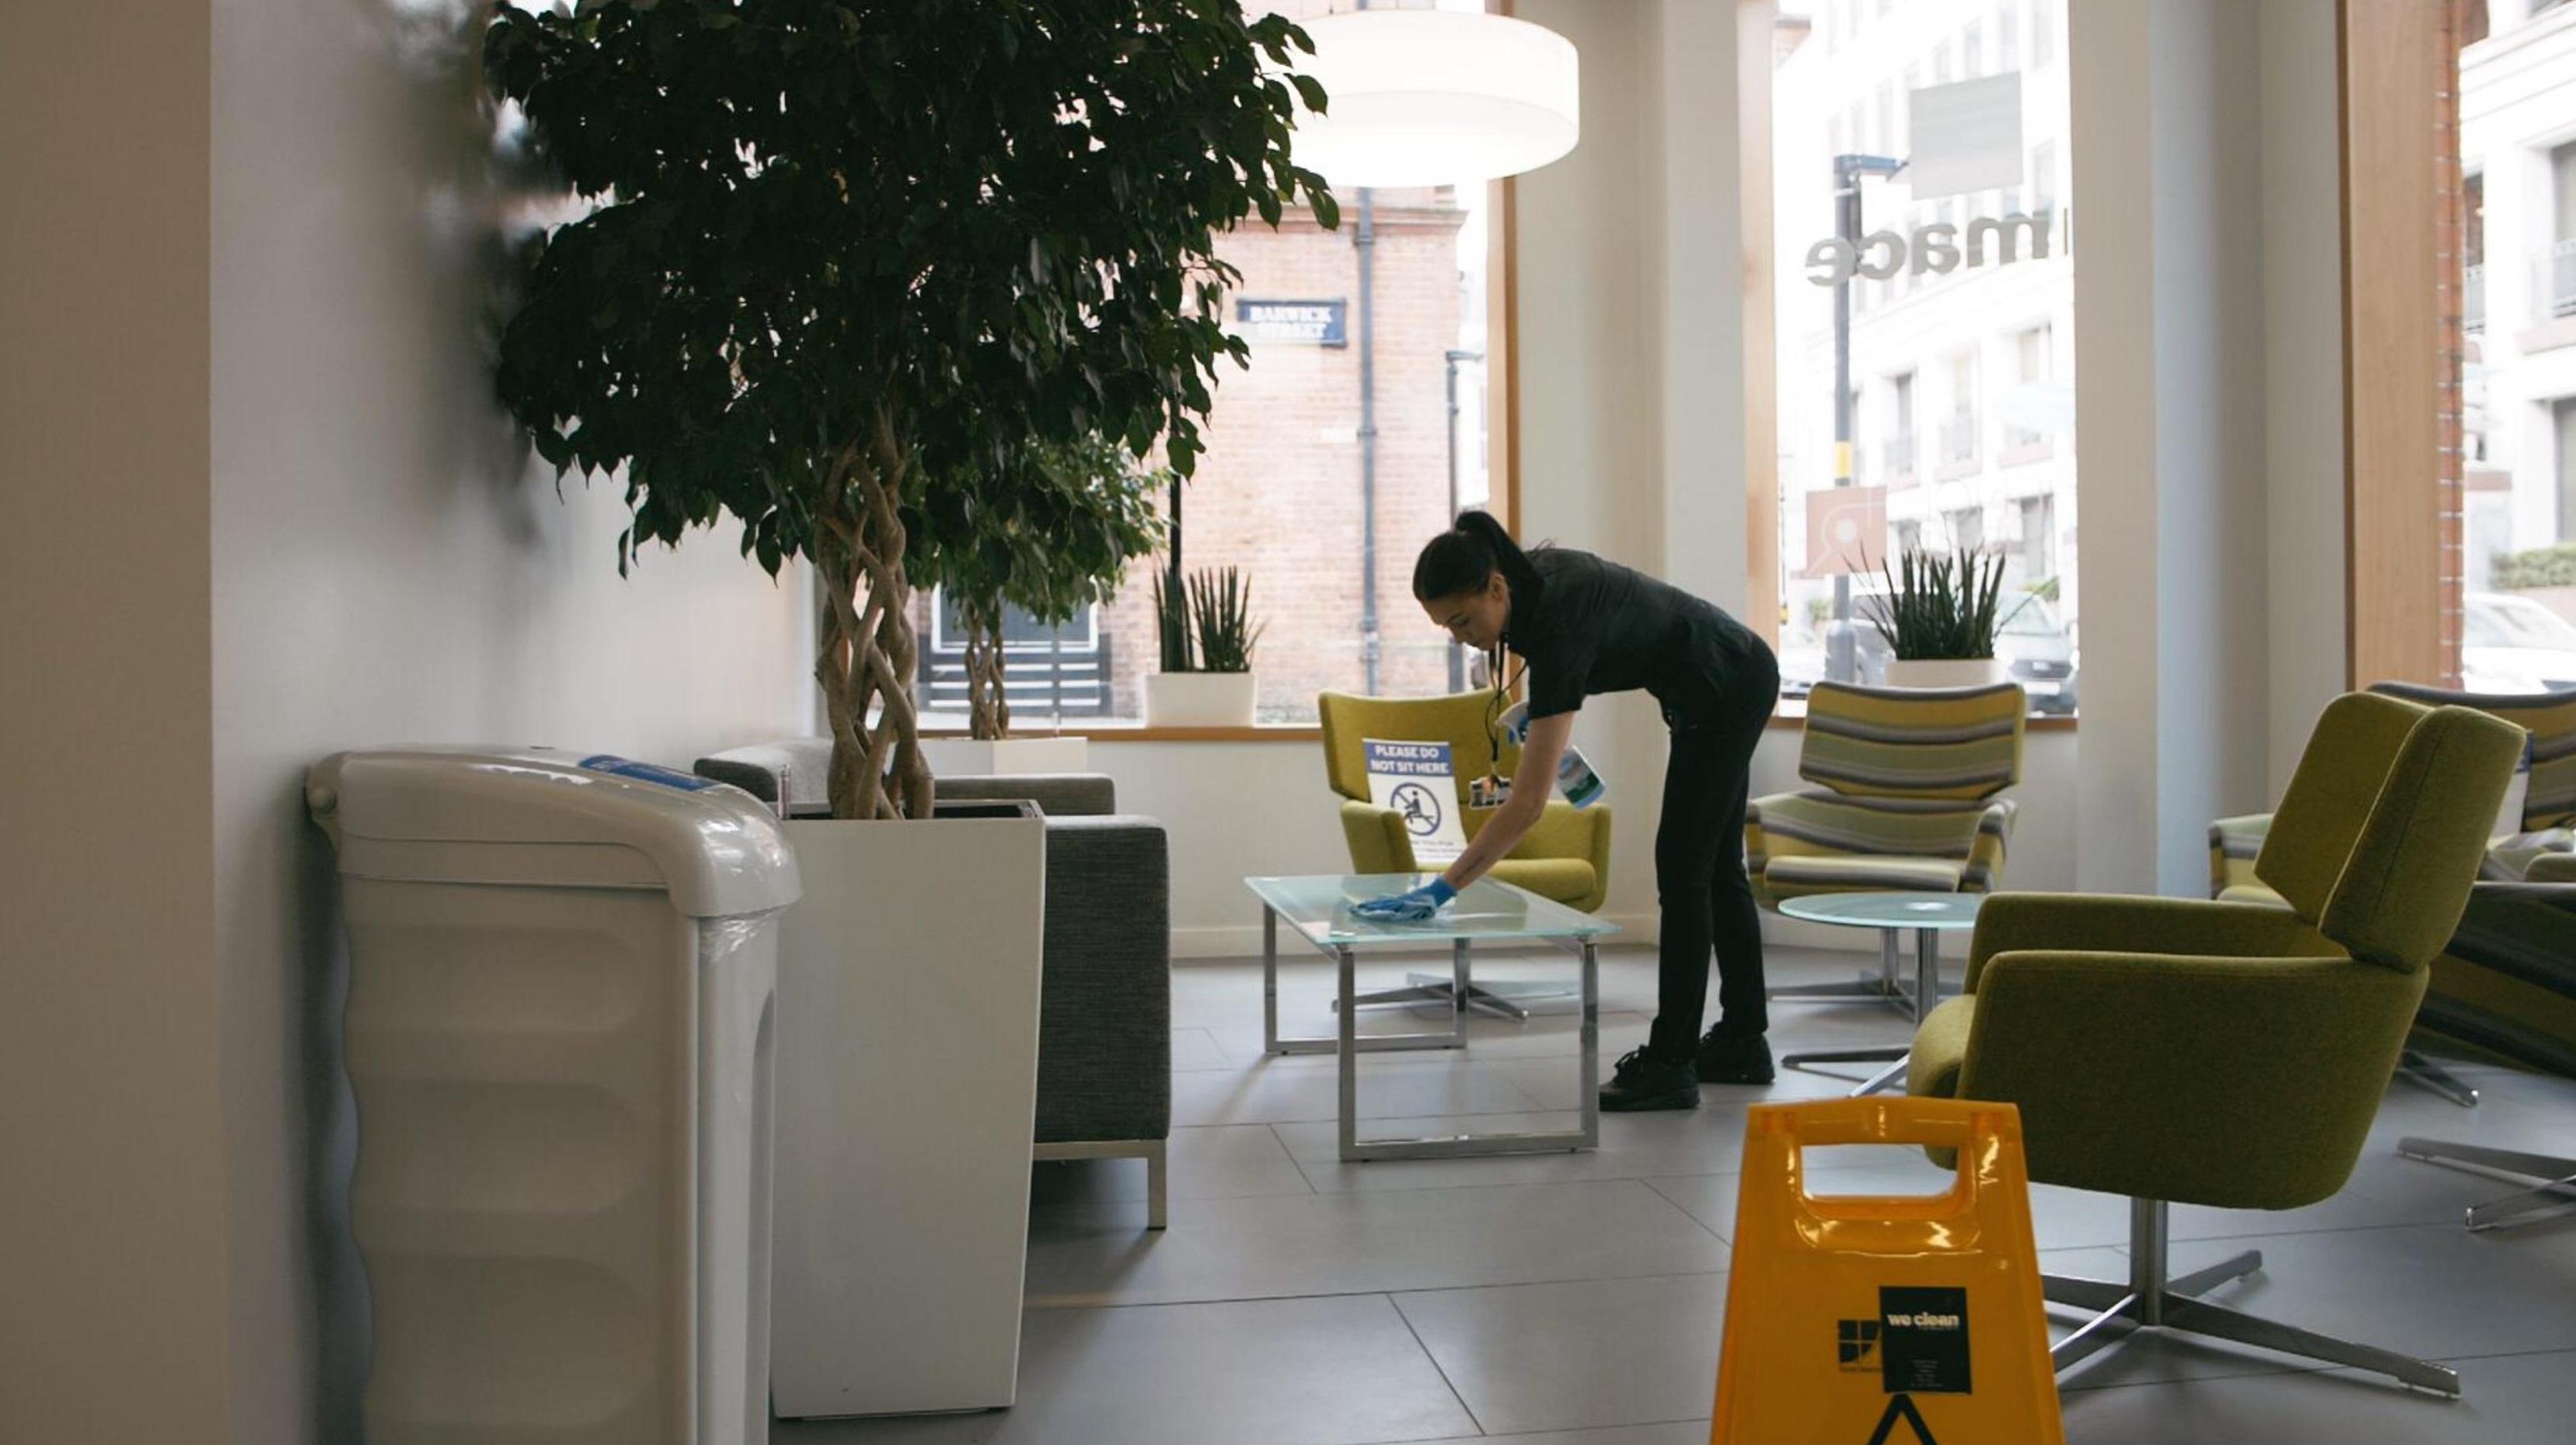 0001-24-1 Office Cleaning Birmingham